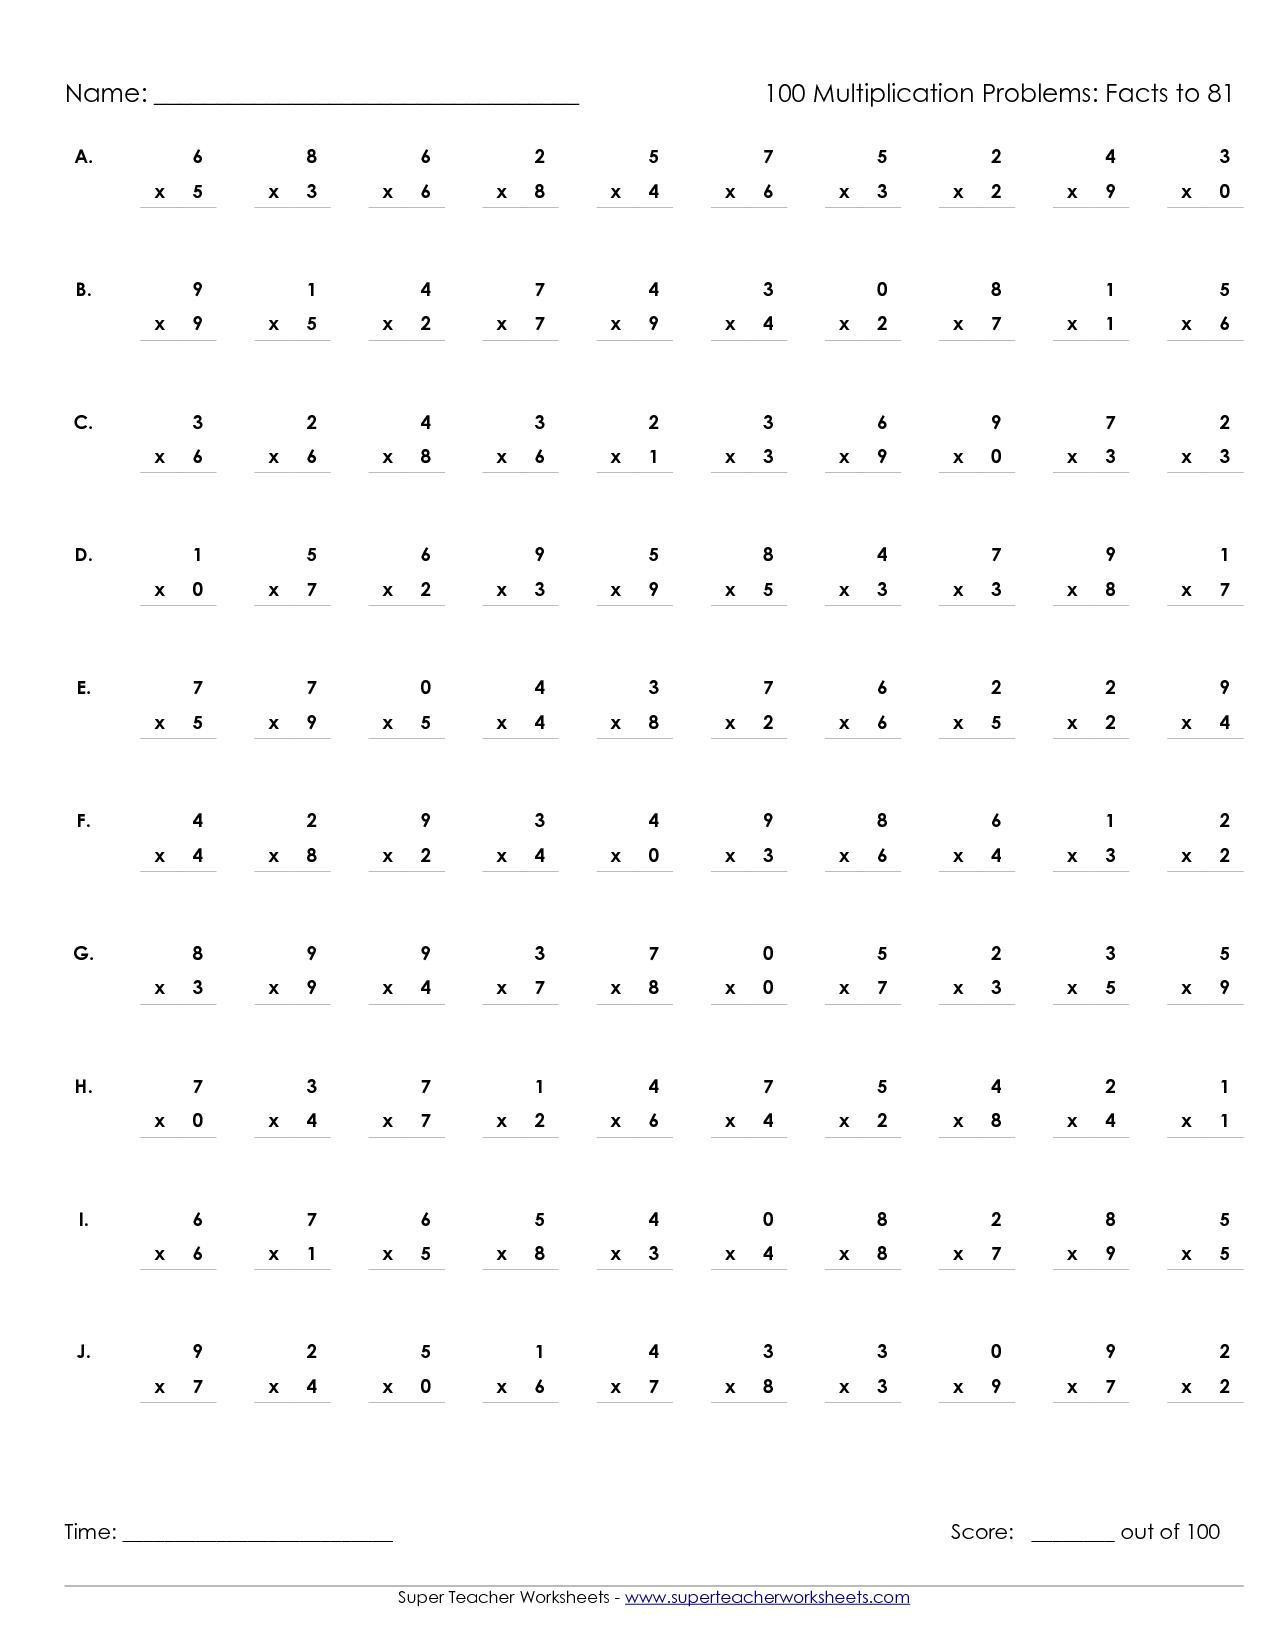 Printable Multiplication Worksheets 100 Problems | Math' S - Free Printable Multiplication Worksheets 100 Problems